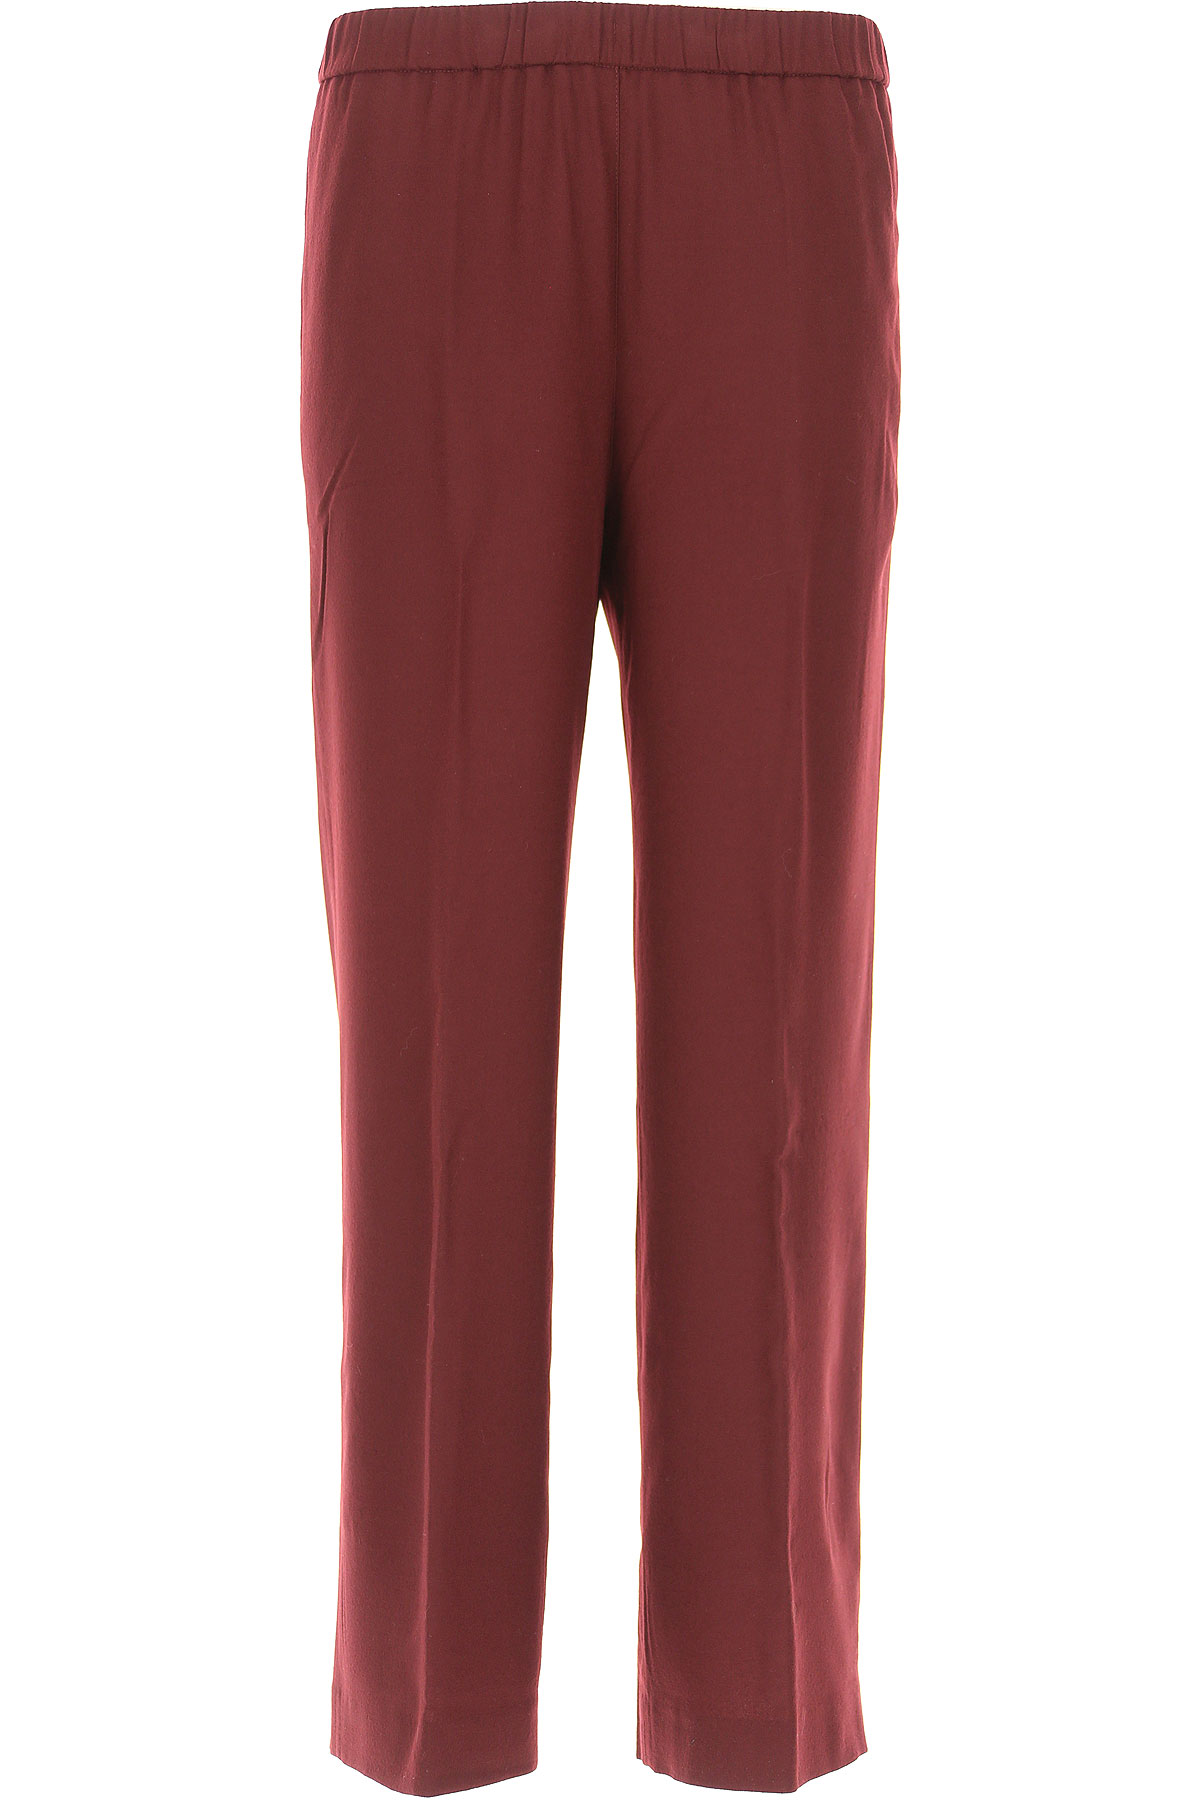 Image of Aspesi Pants for Women, Bordeaux, Wool, 2017, 26 28 32